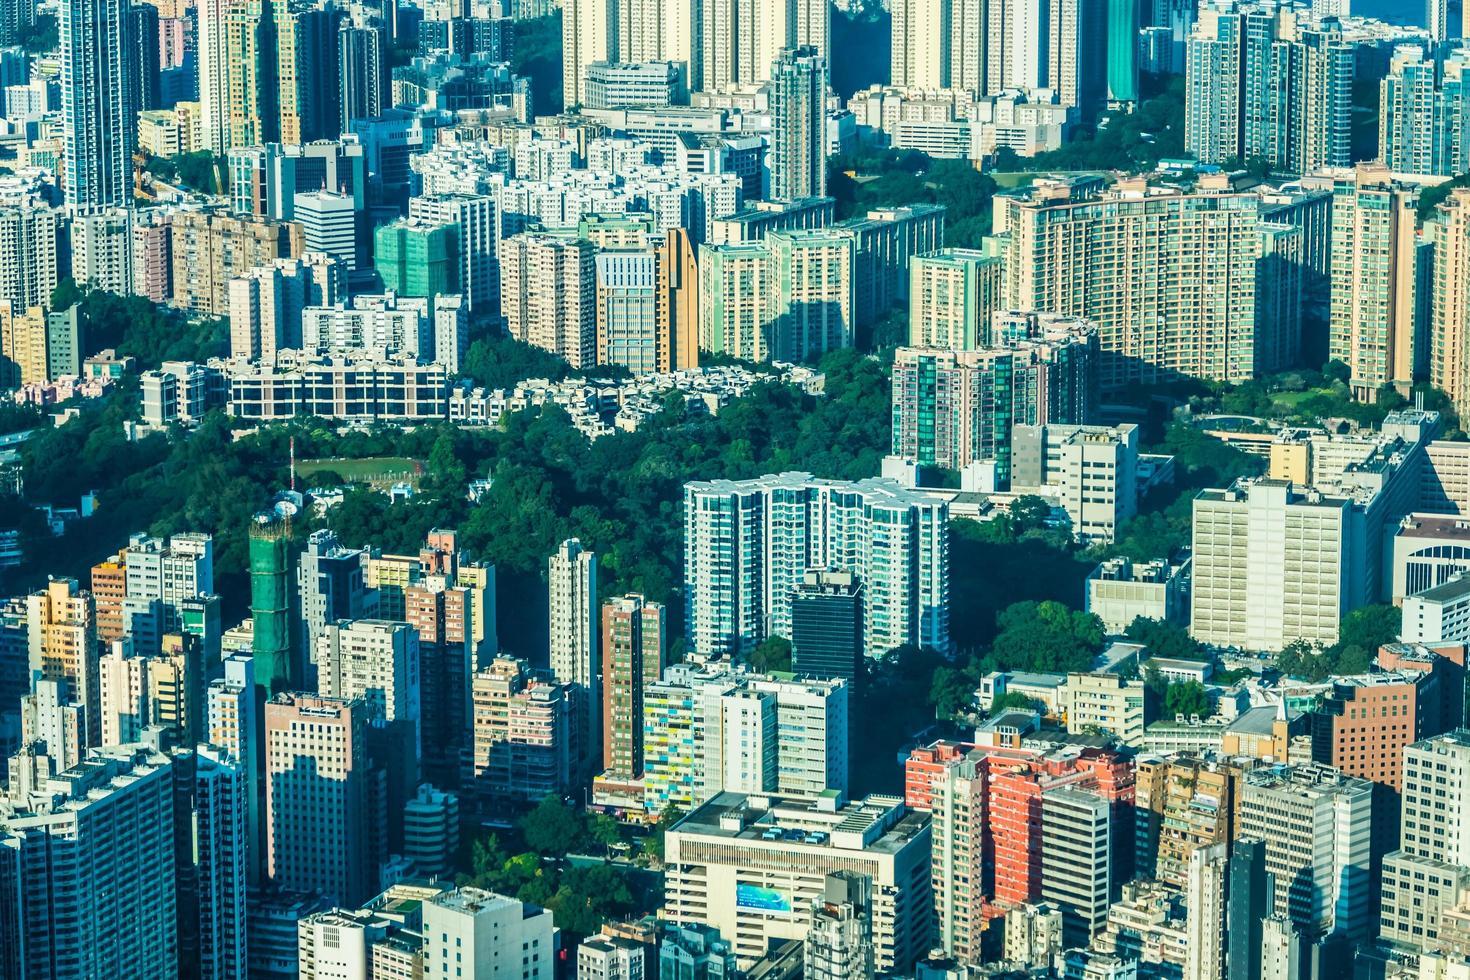 Gebäude von Hongkong, China foto